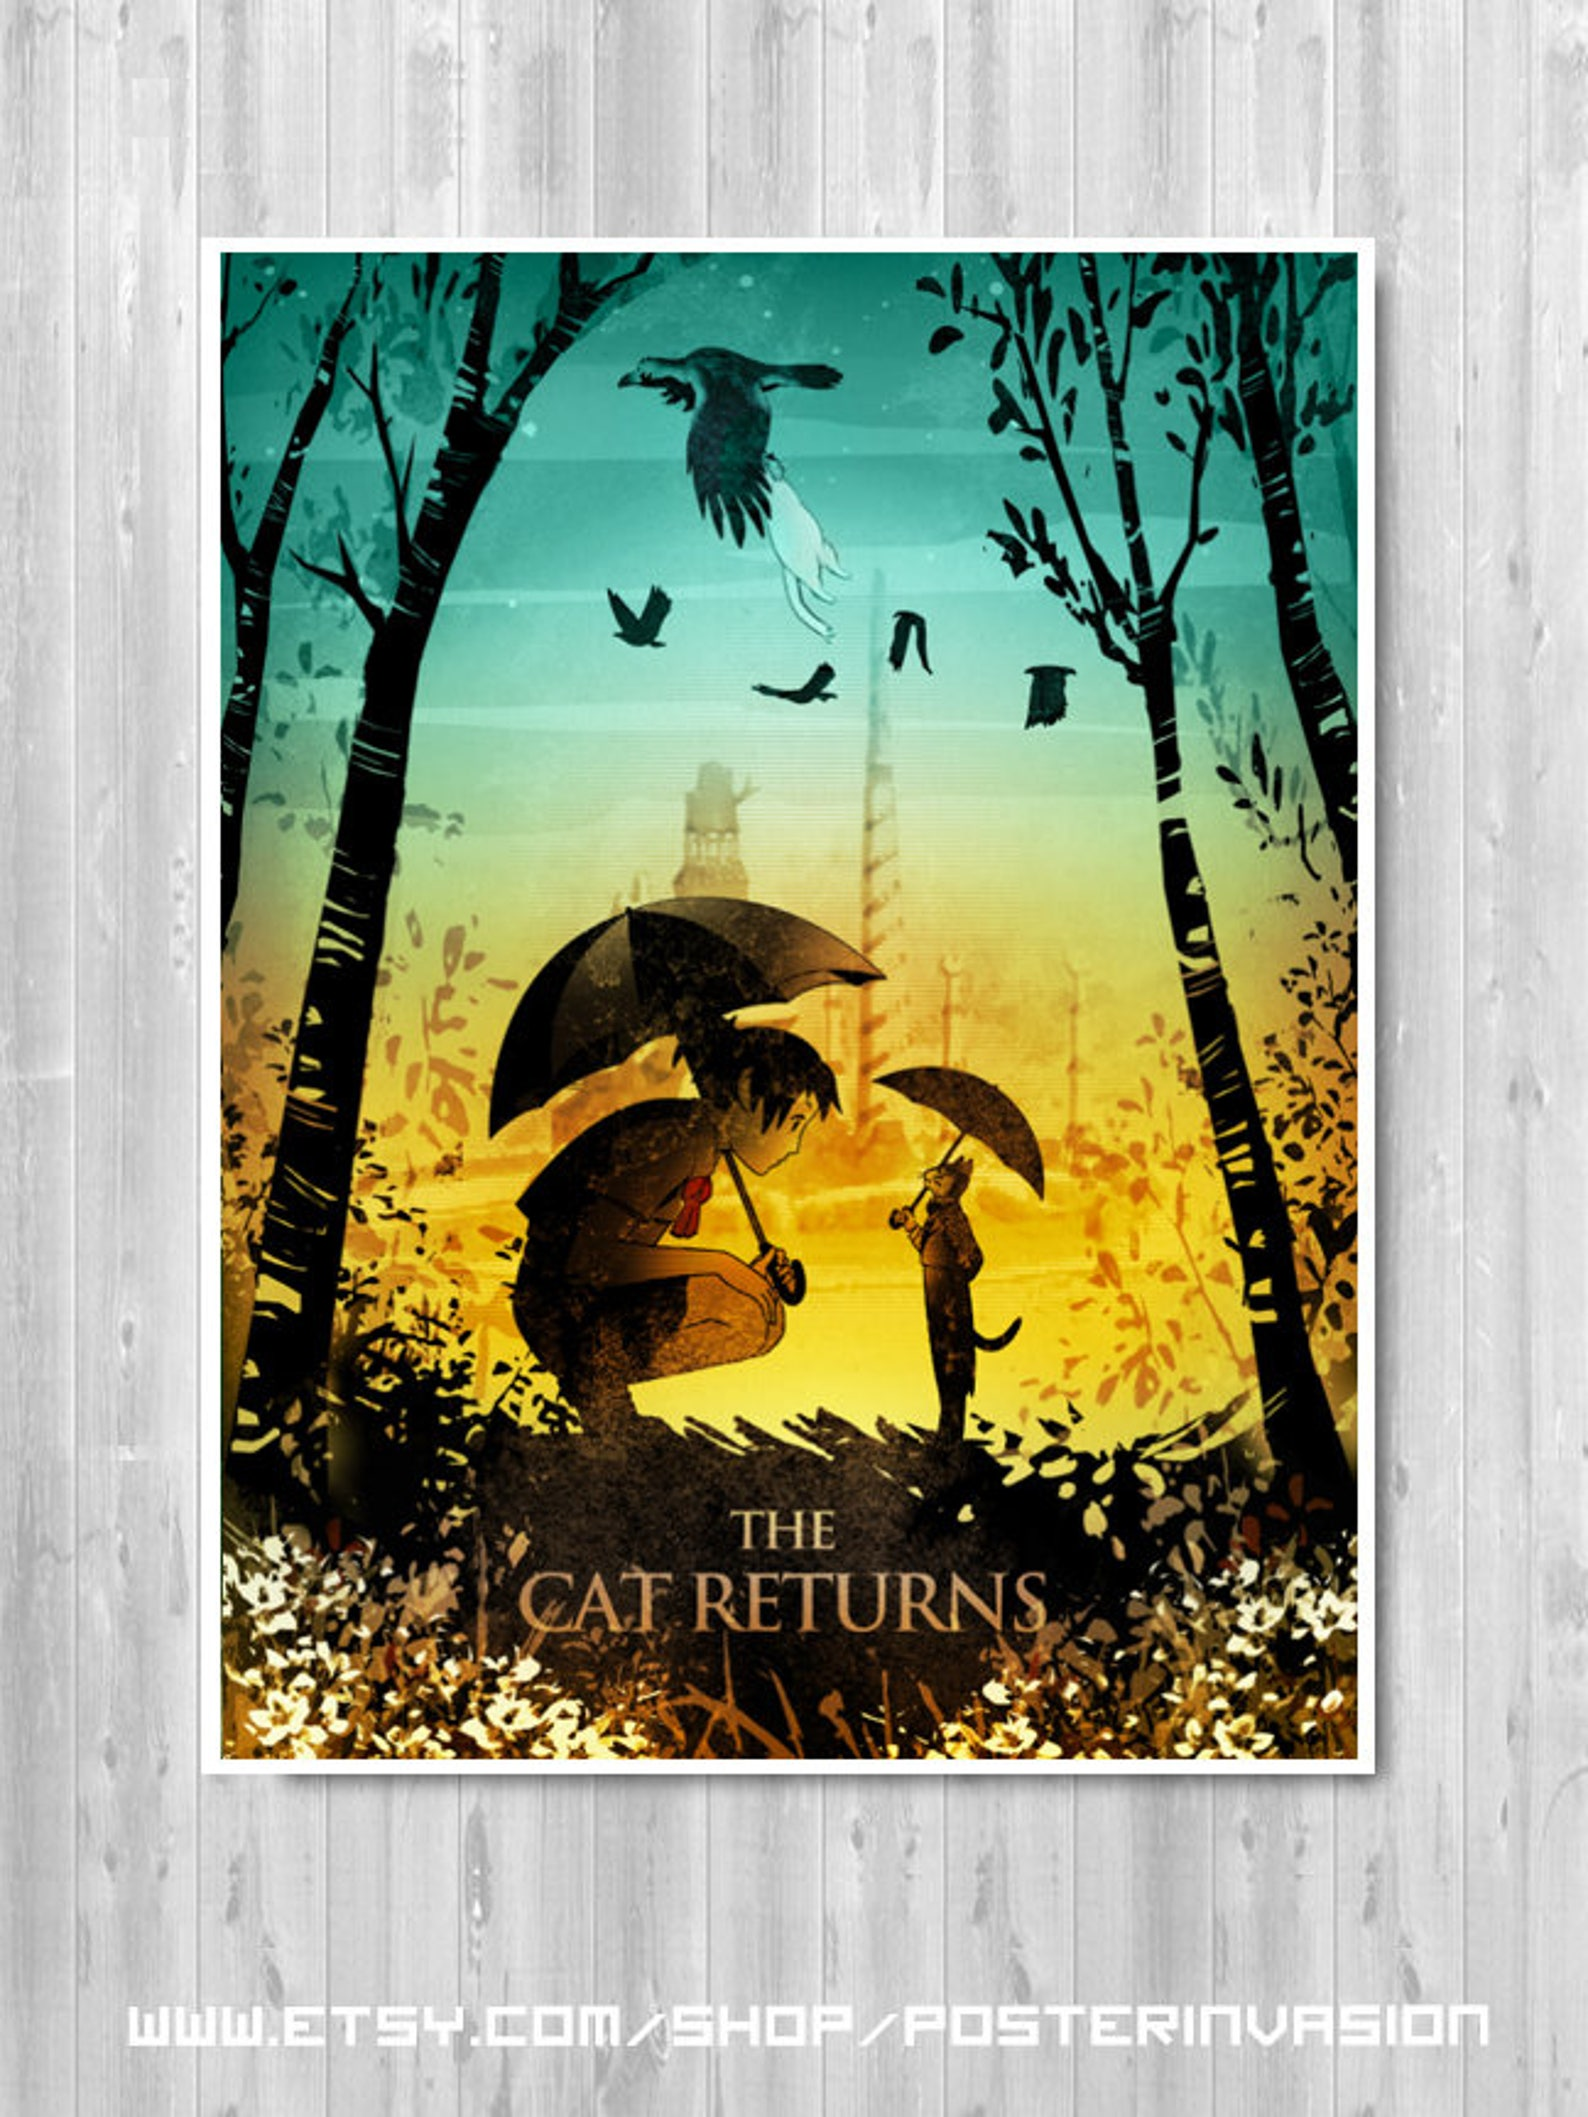 The Cat Returns Poster, Studio Ghibli, Minimalist Movie poster